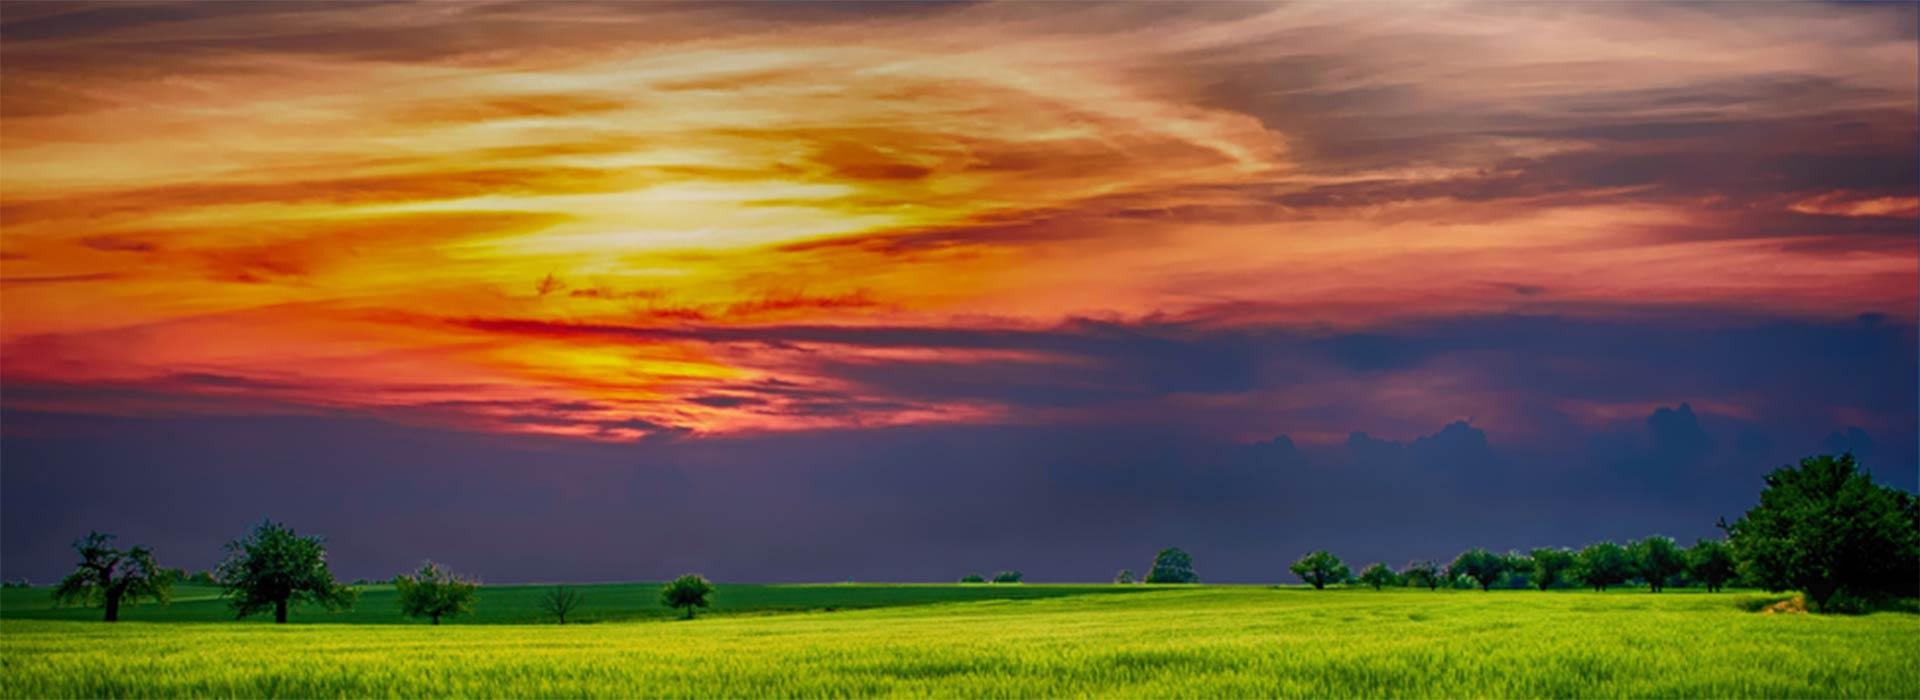 david-london-agriculture-horizon